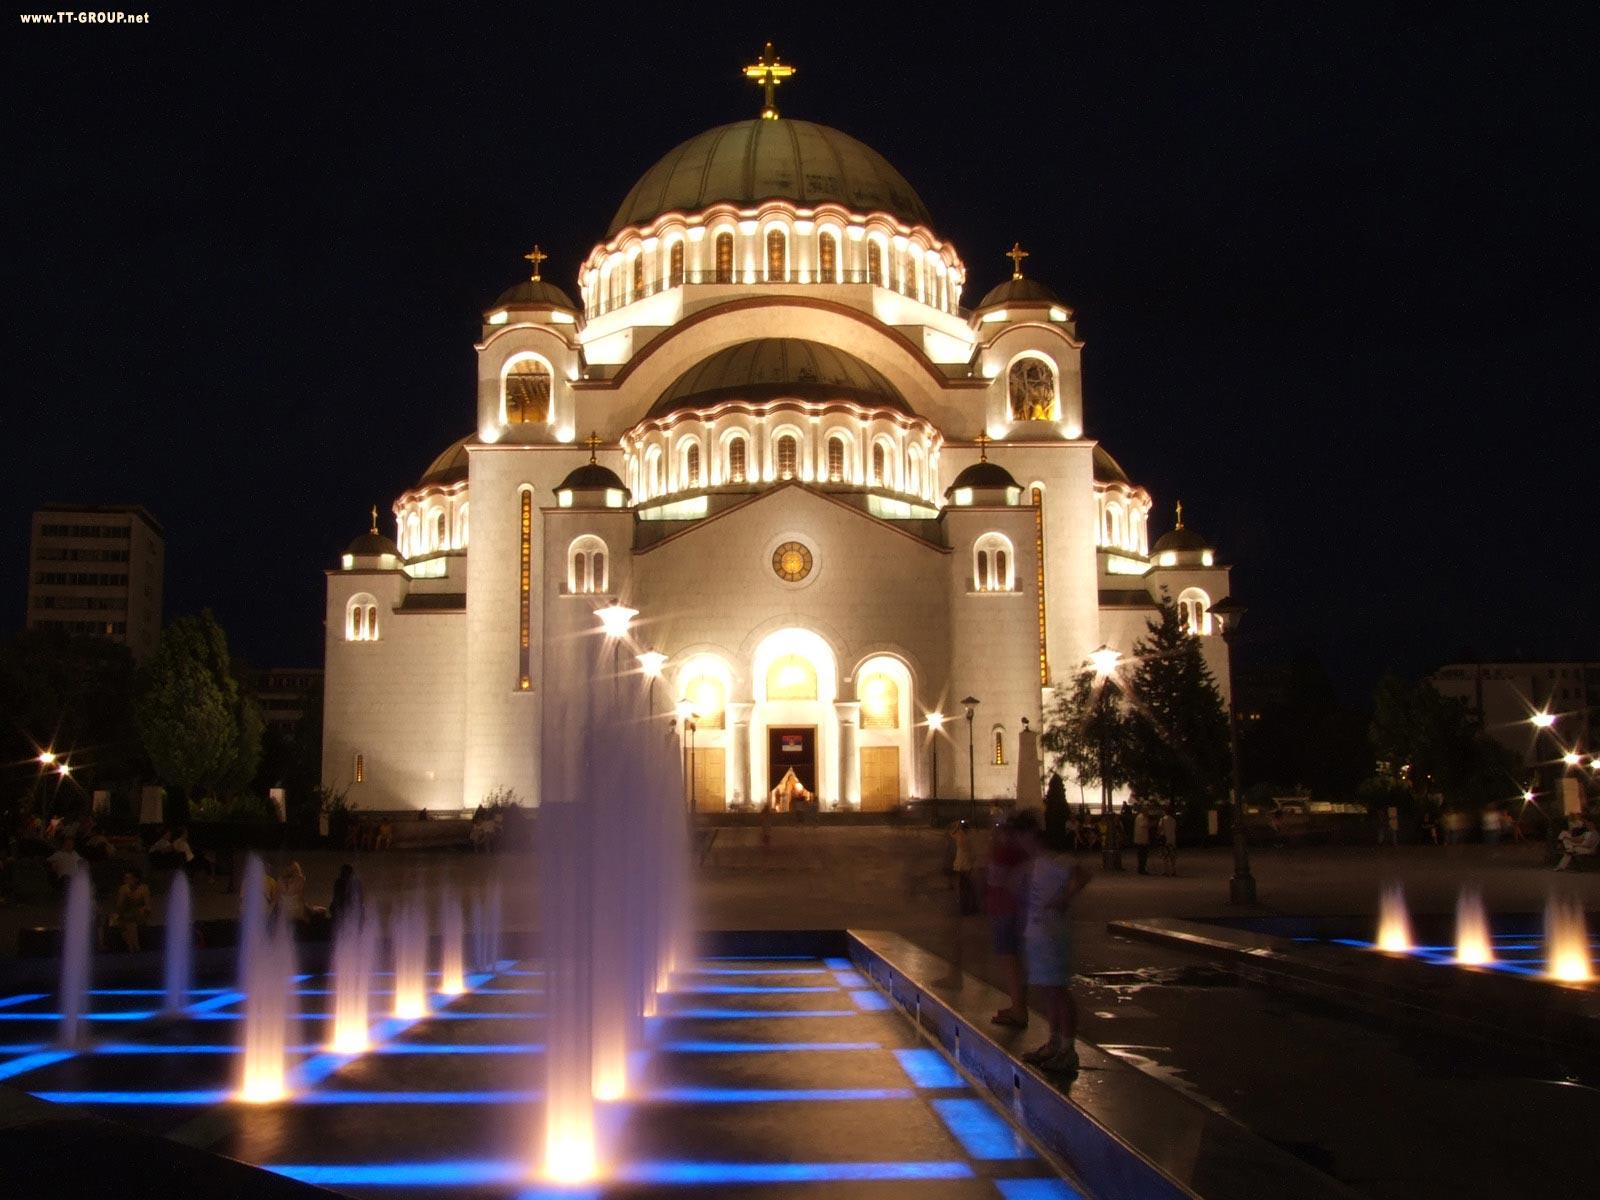 http://www.tt-group.net/fotografije_beograda/Sveti_Sava_nova_svetla/SvSavaNovaSvetla2.jpg